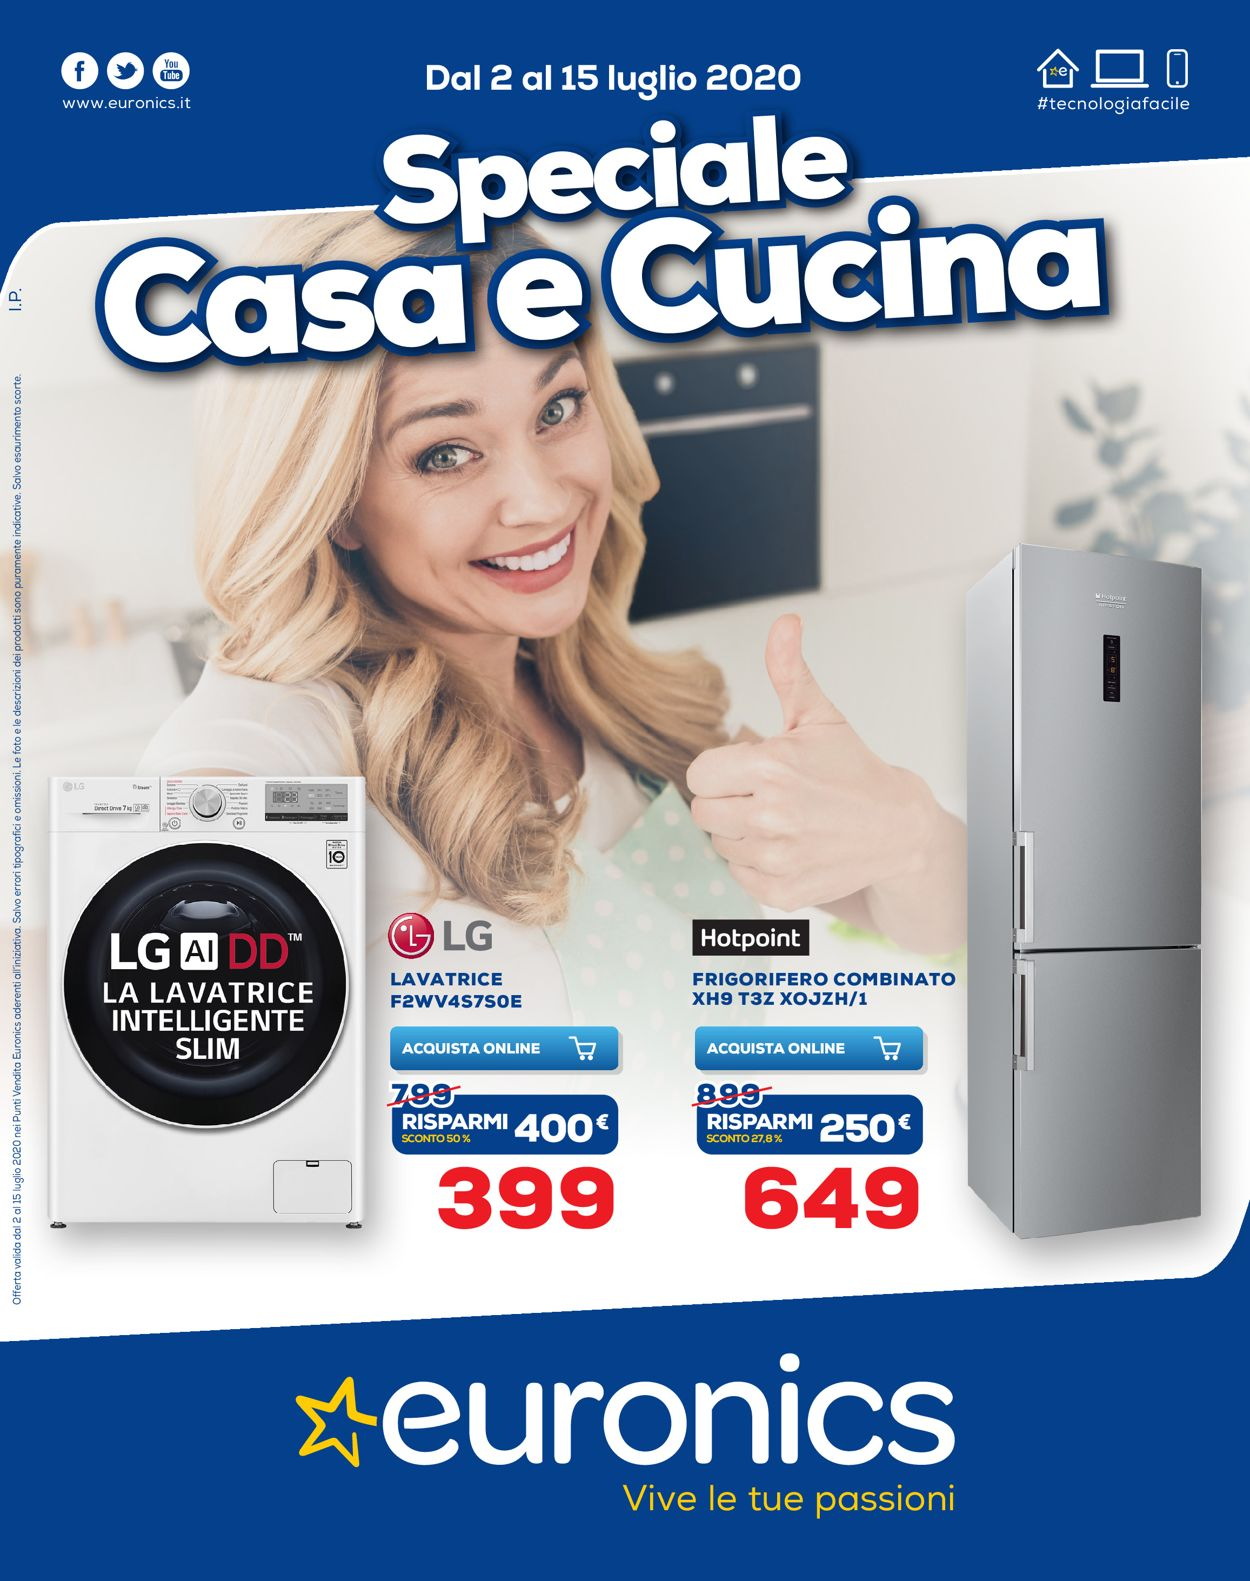 Volantino Euronics - Offerte 02/07-15/07/2020